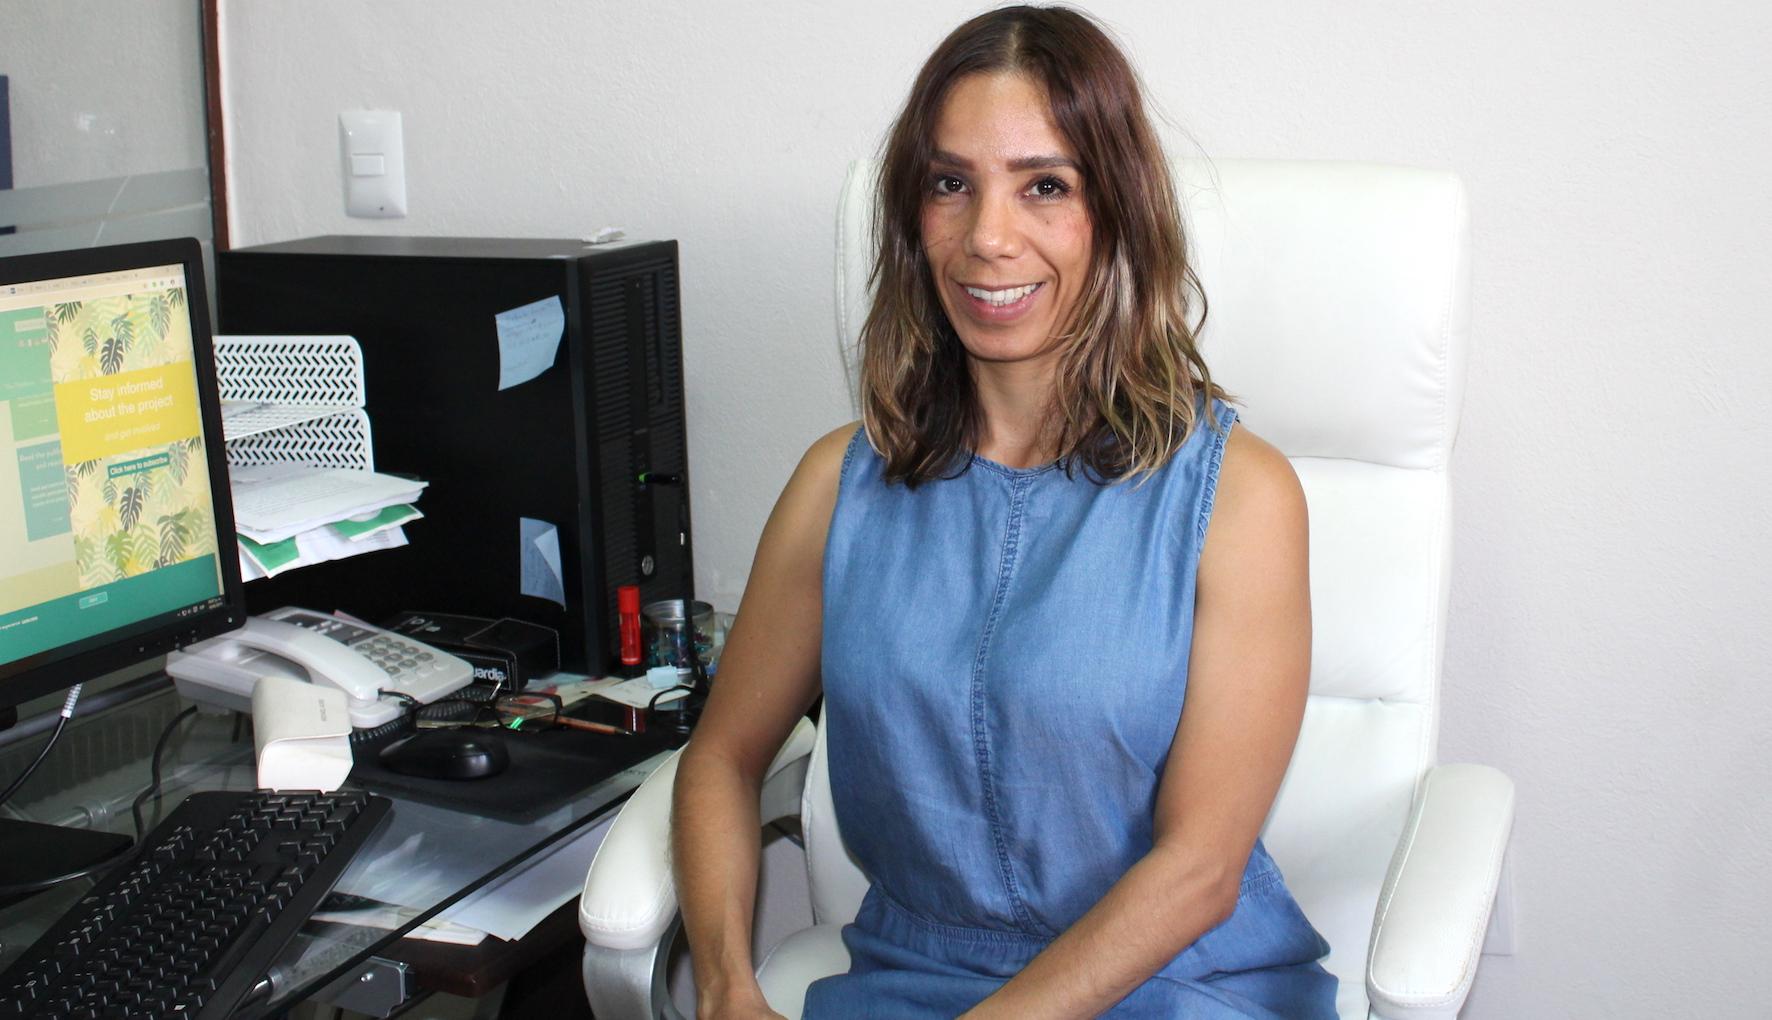 Natalie Rosales